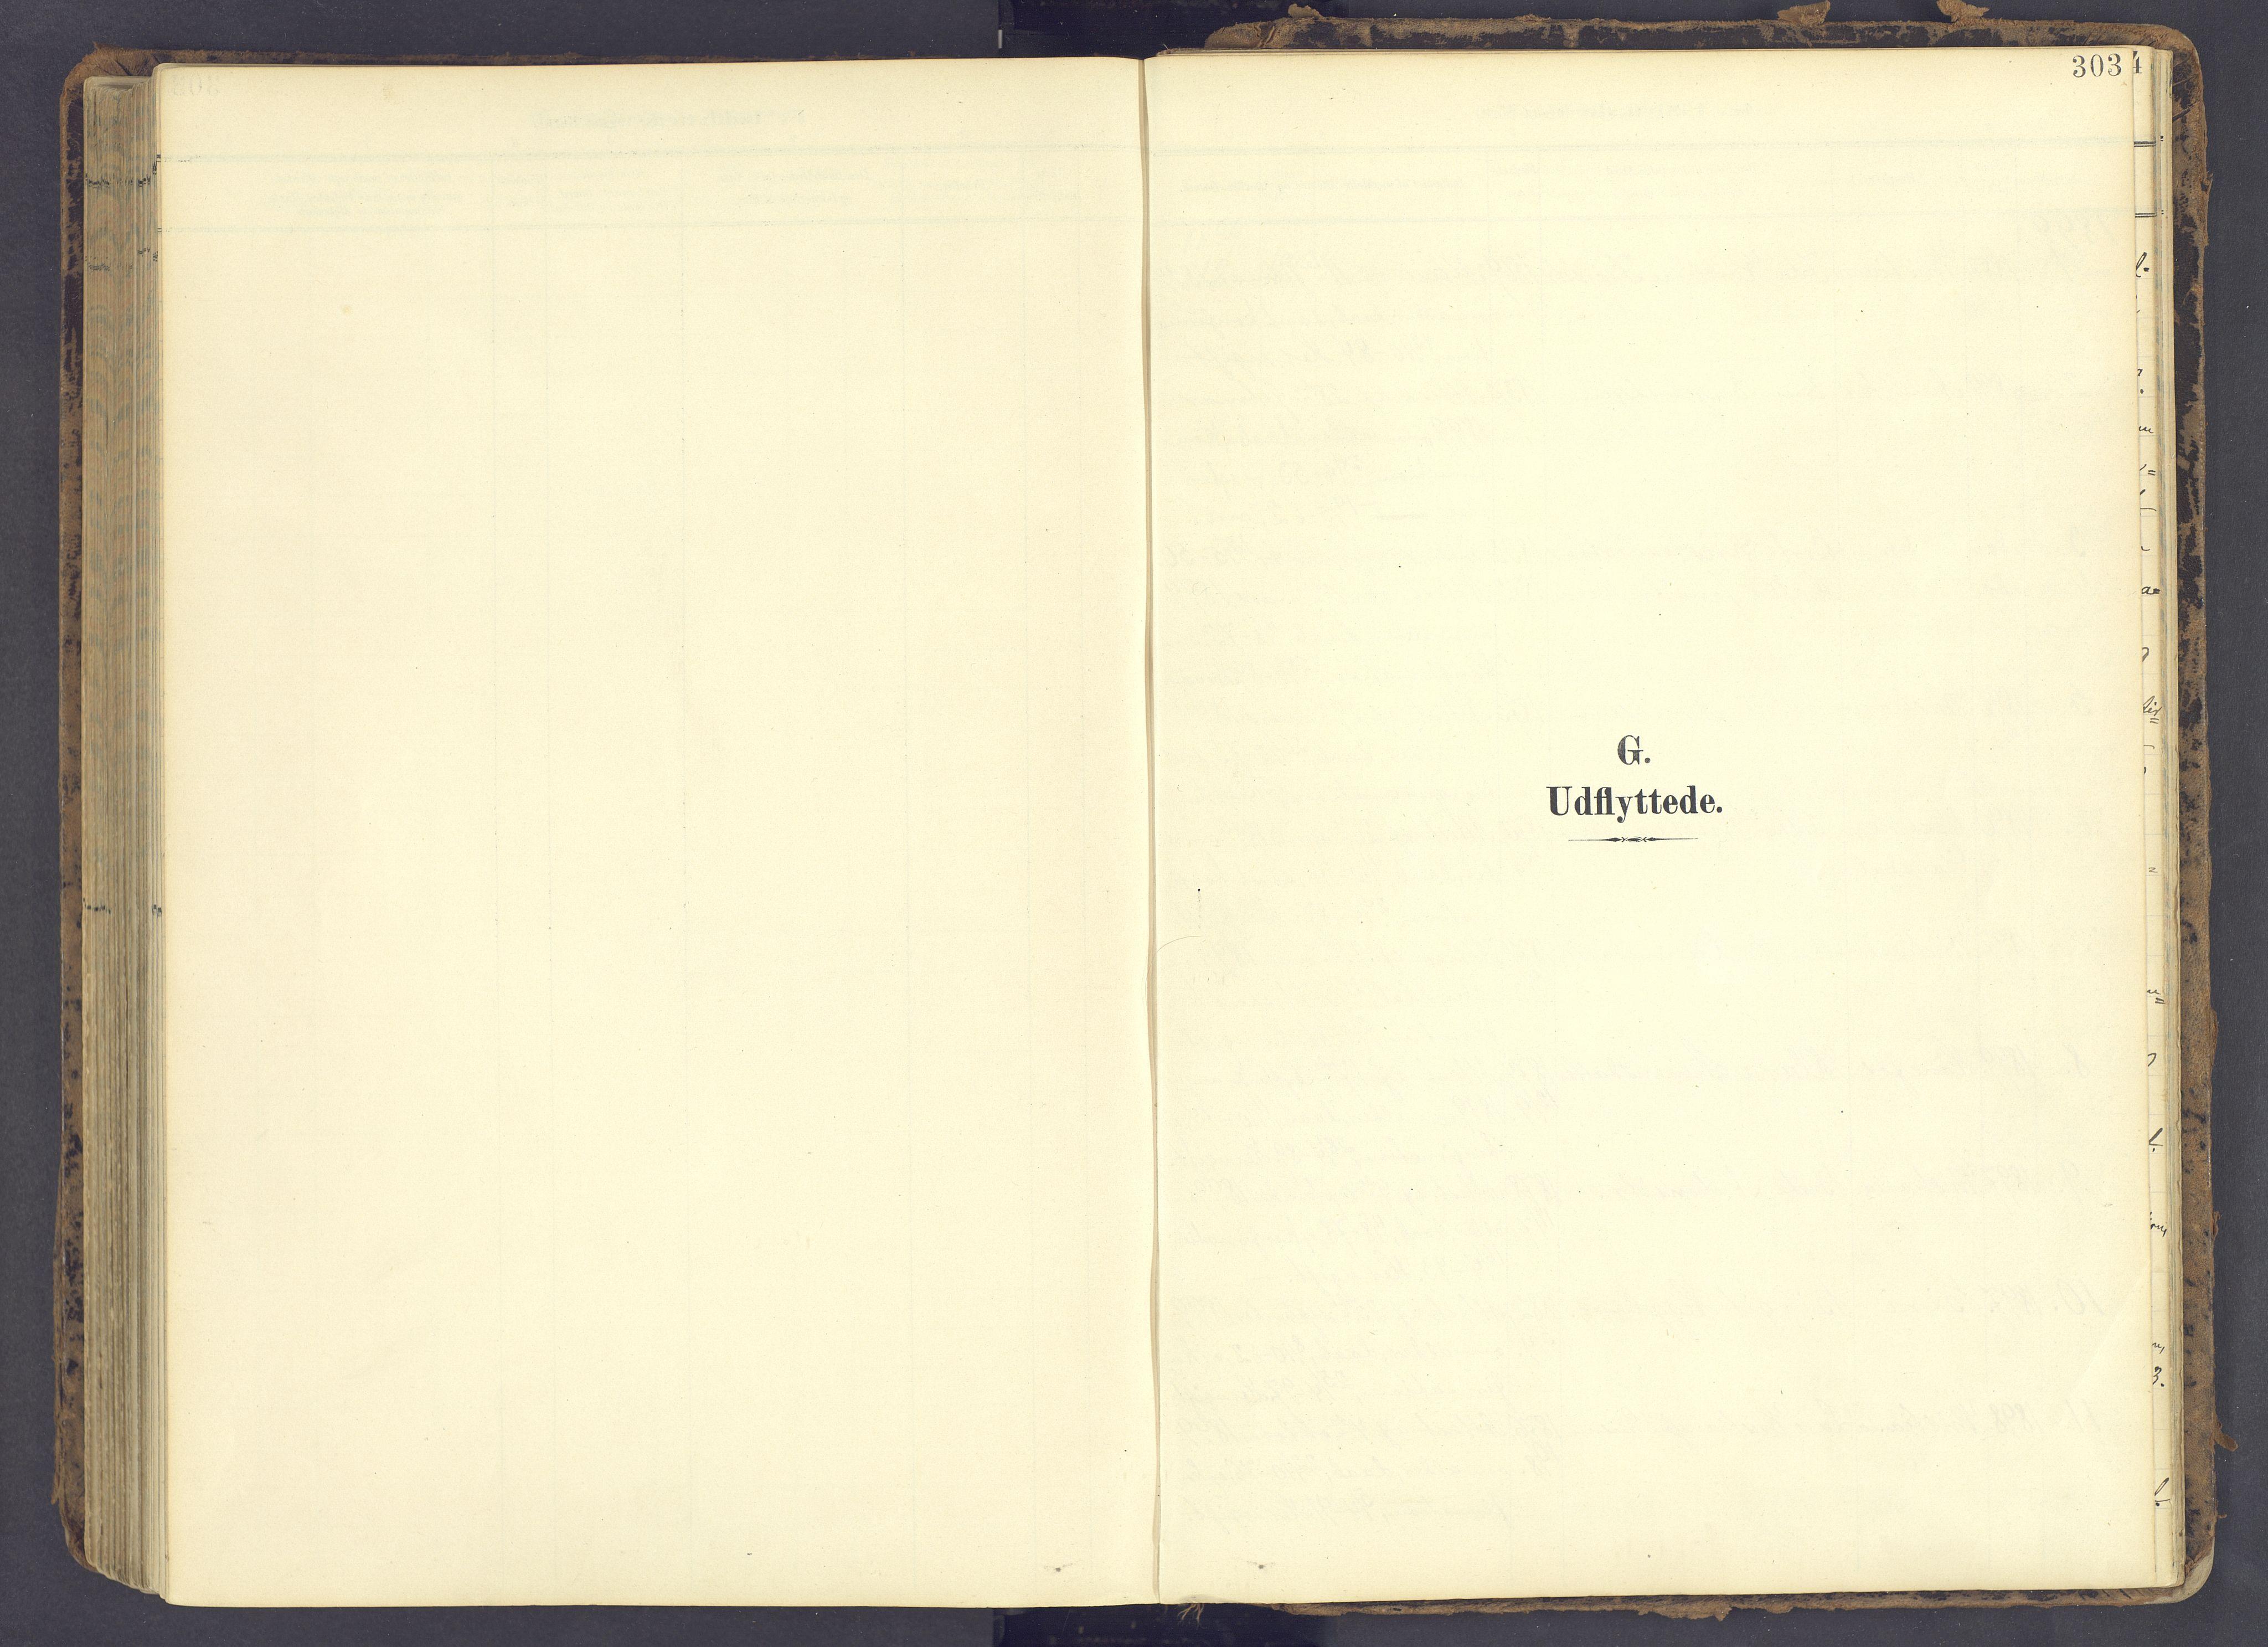 SAH, Fåberg prestekontor, Ministerialbok nr. 12, 1899-1915, s. 303